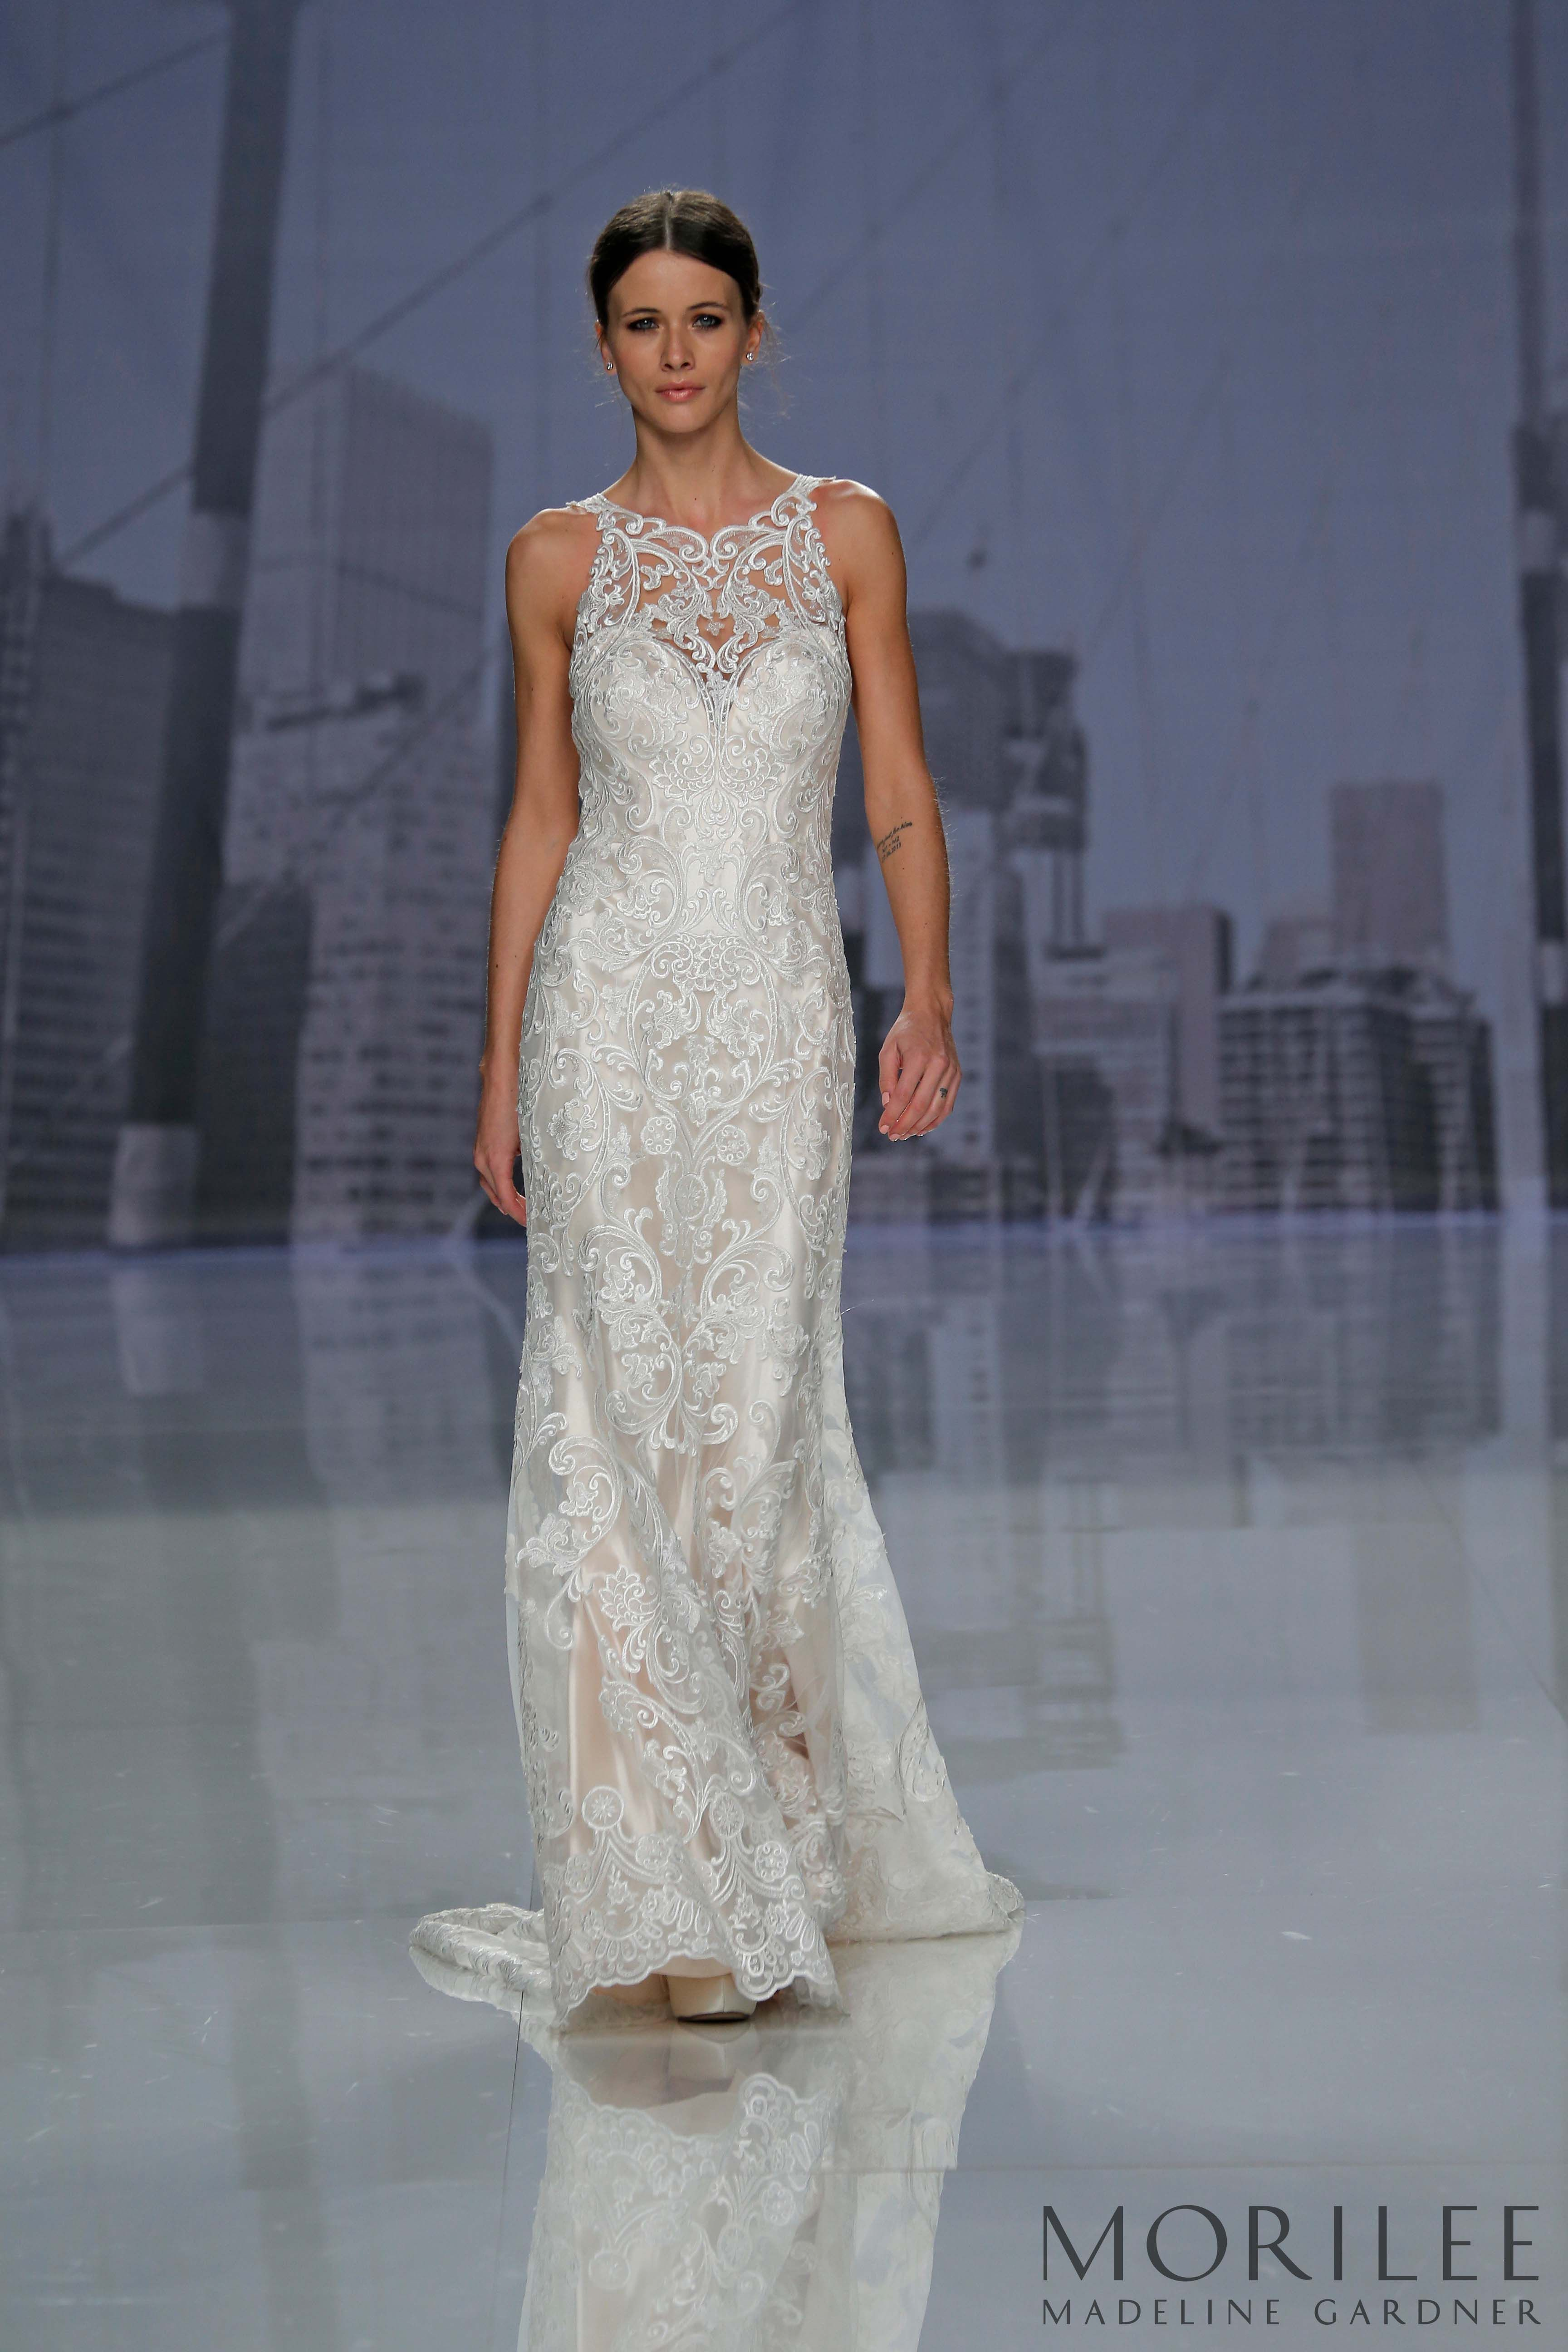 Mimi Wedding Dress Morilee In 2020 Dresses Wedding Dress